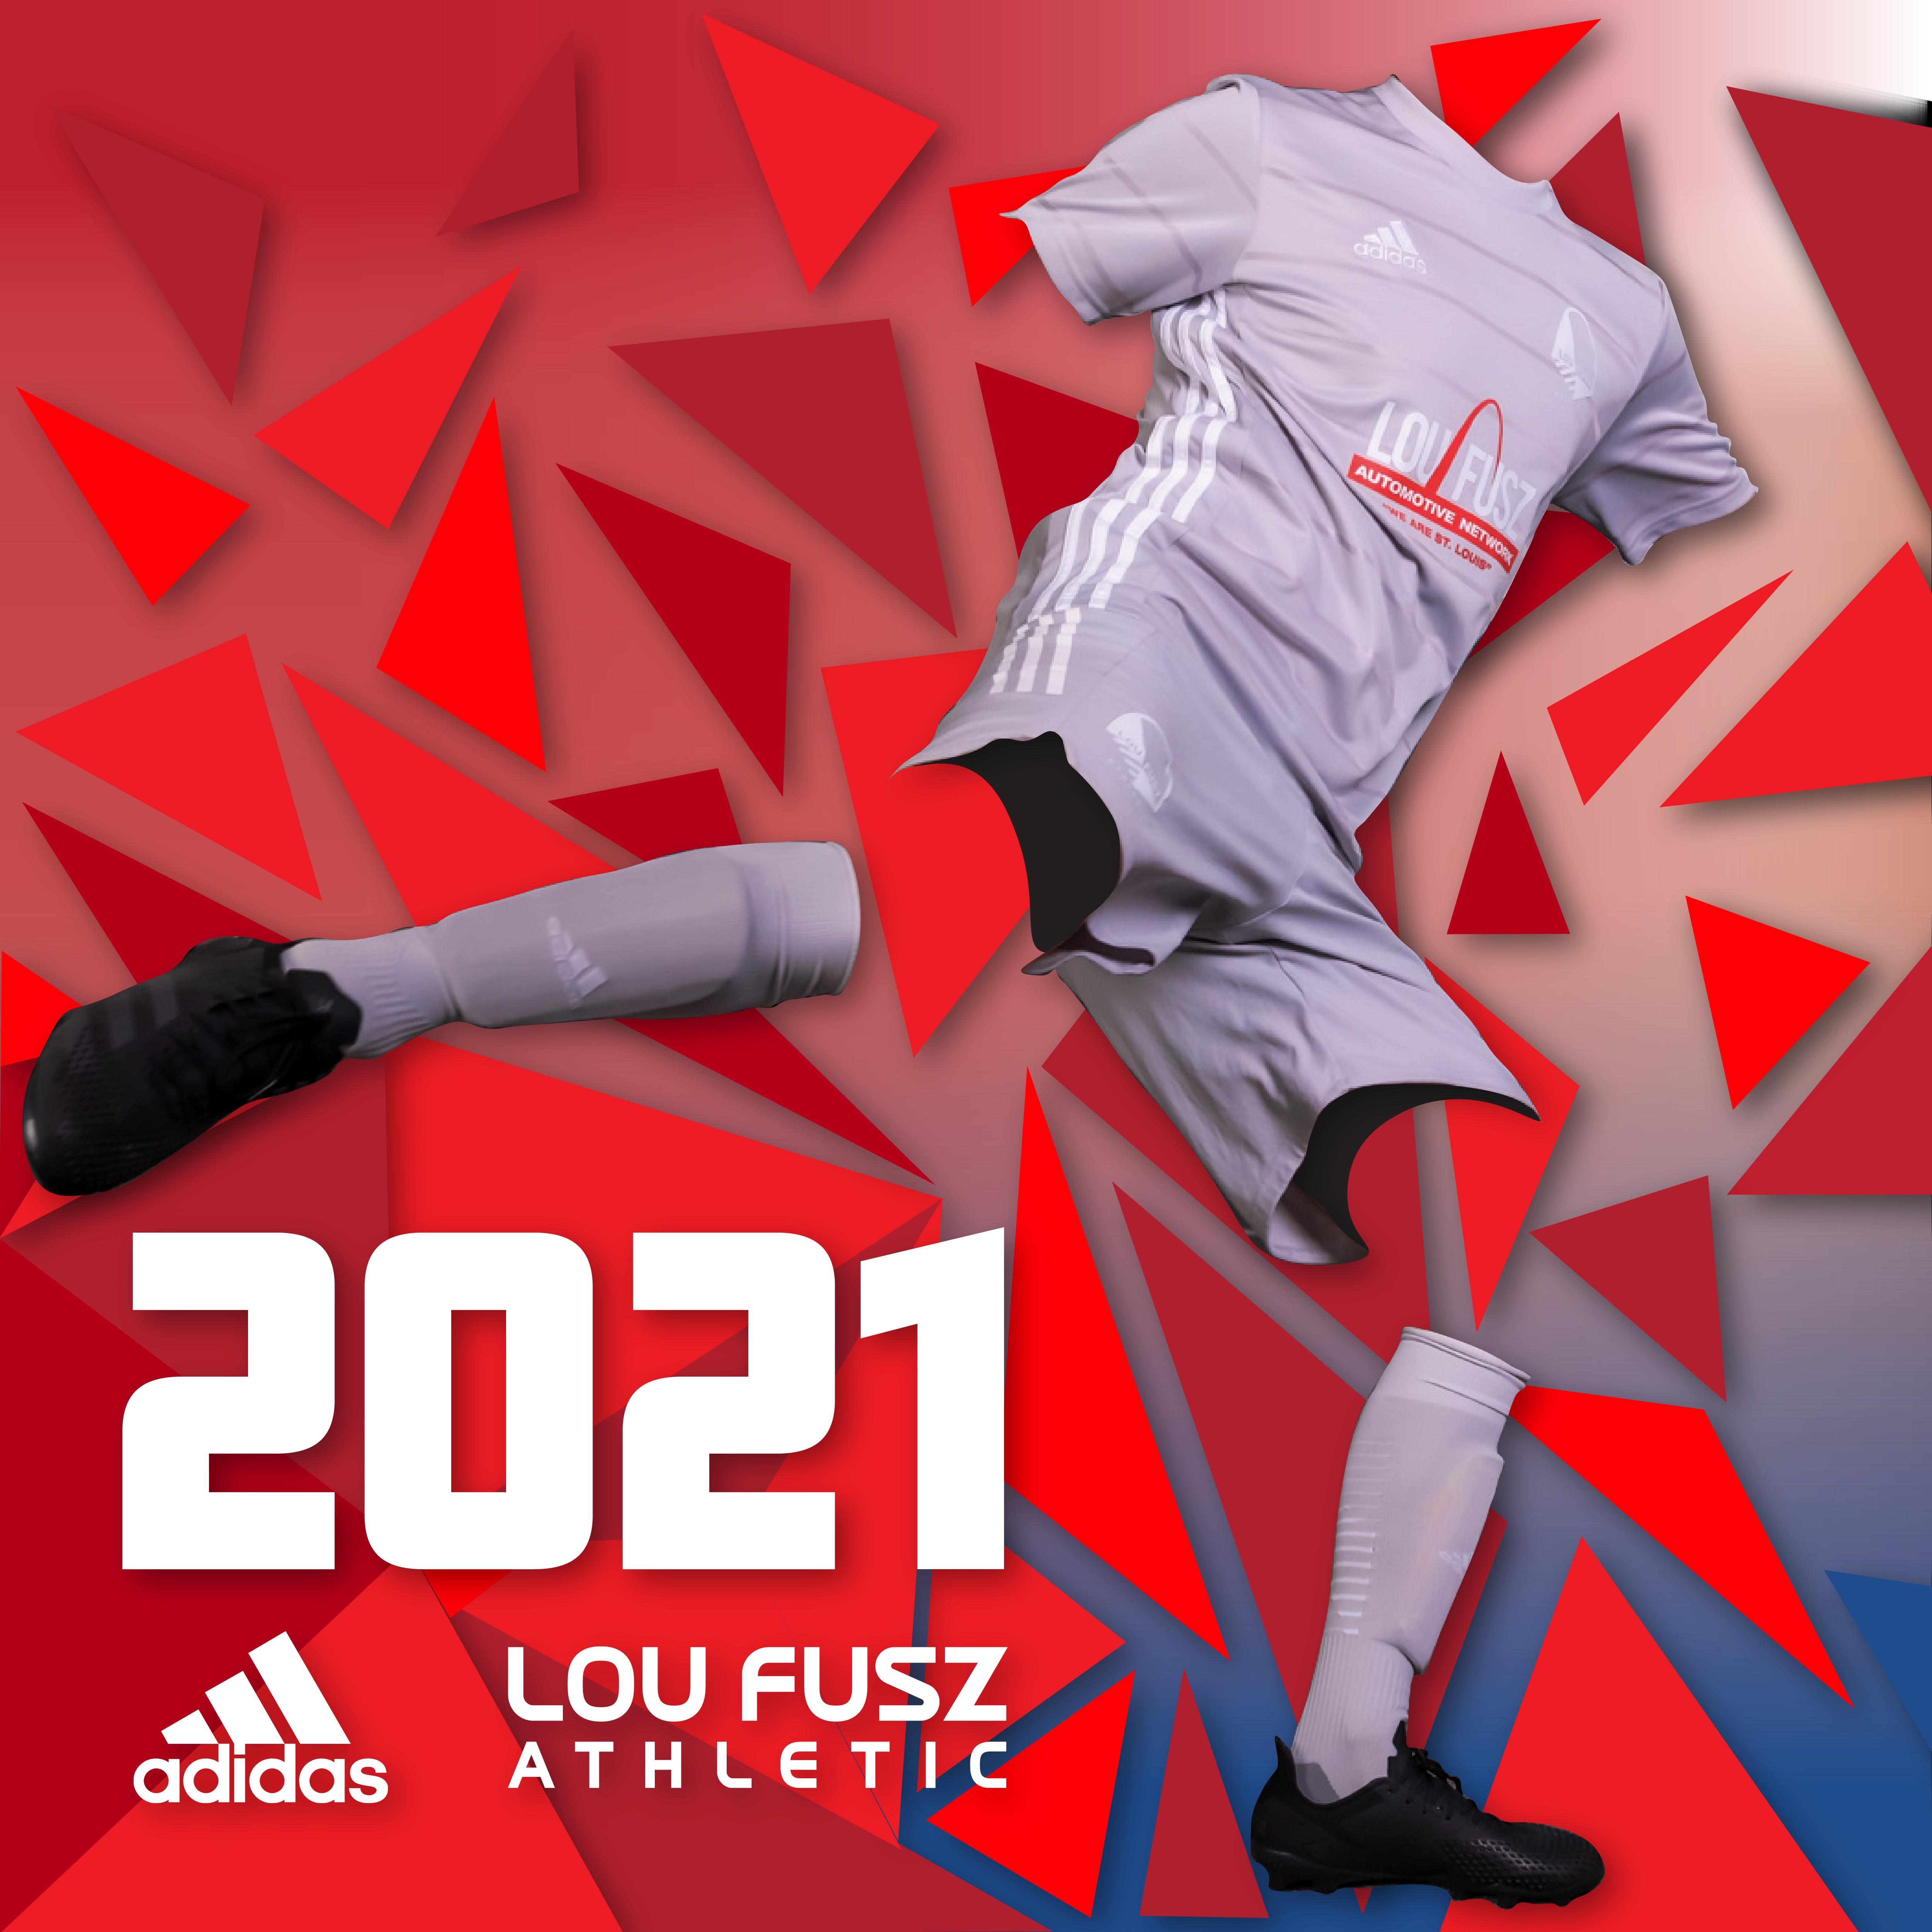 2021 Jersey Design